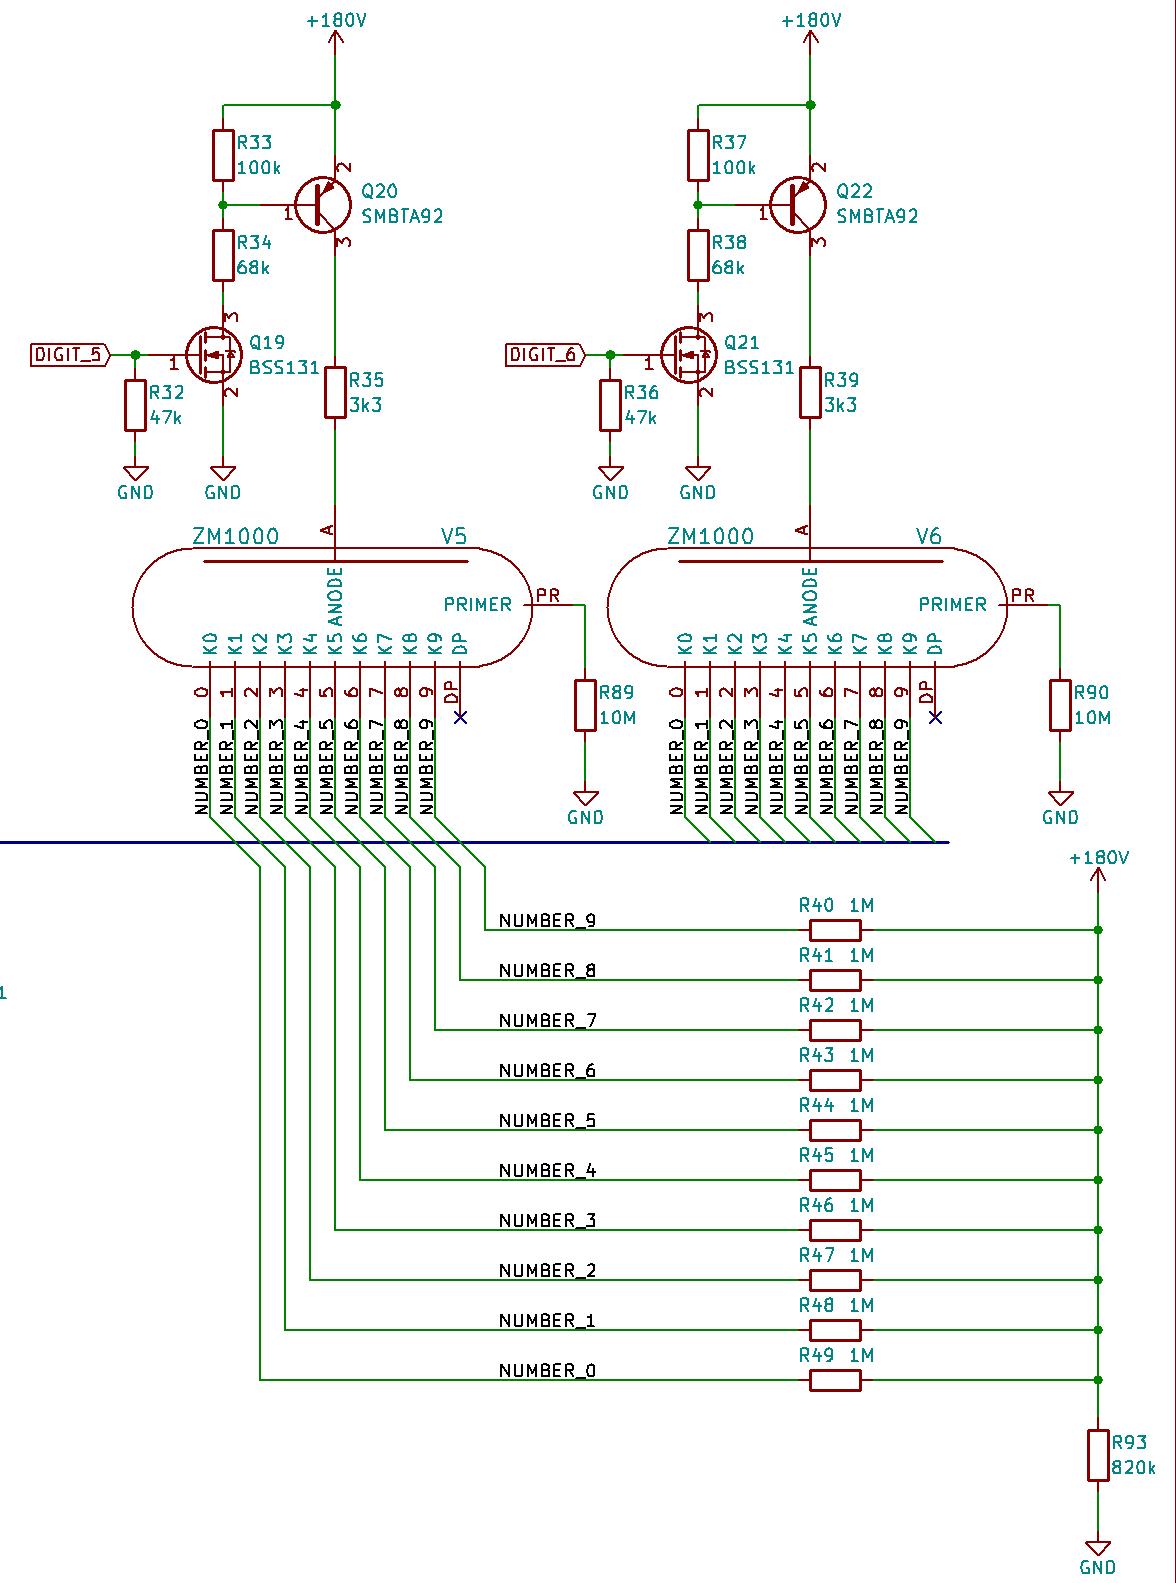 BP/pictures/digitrony_multiplex_2.png